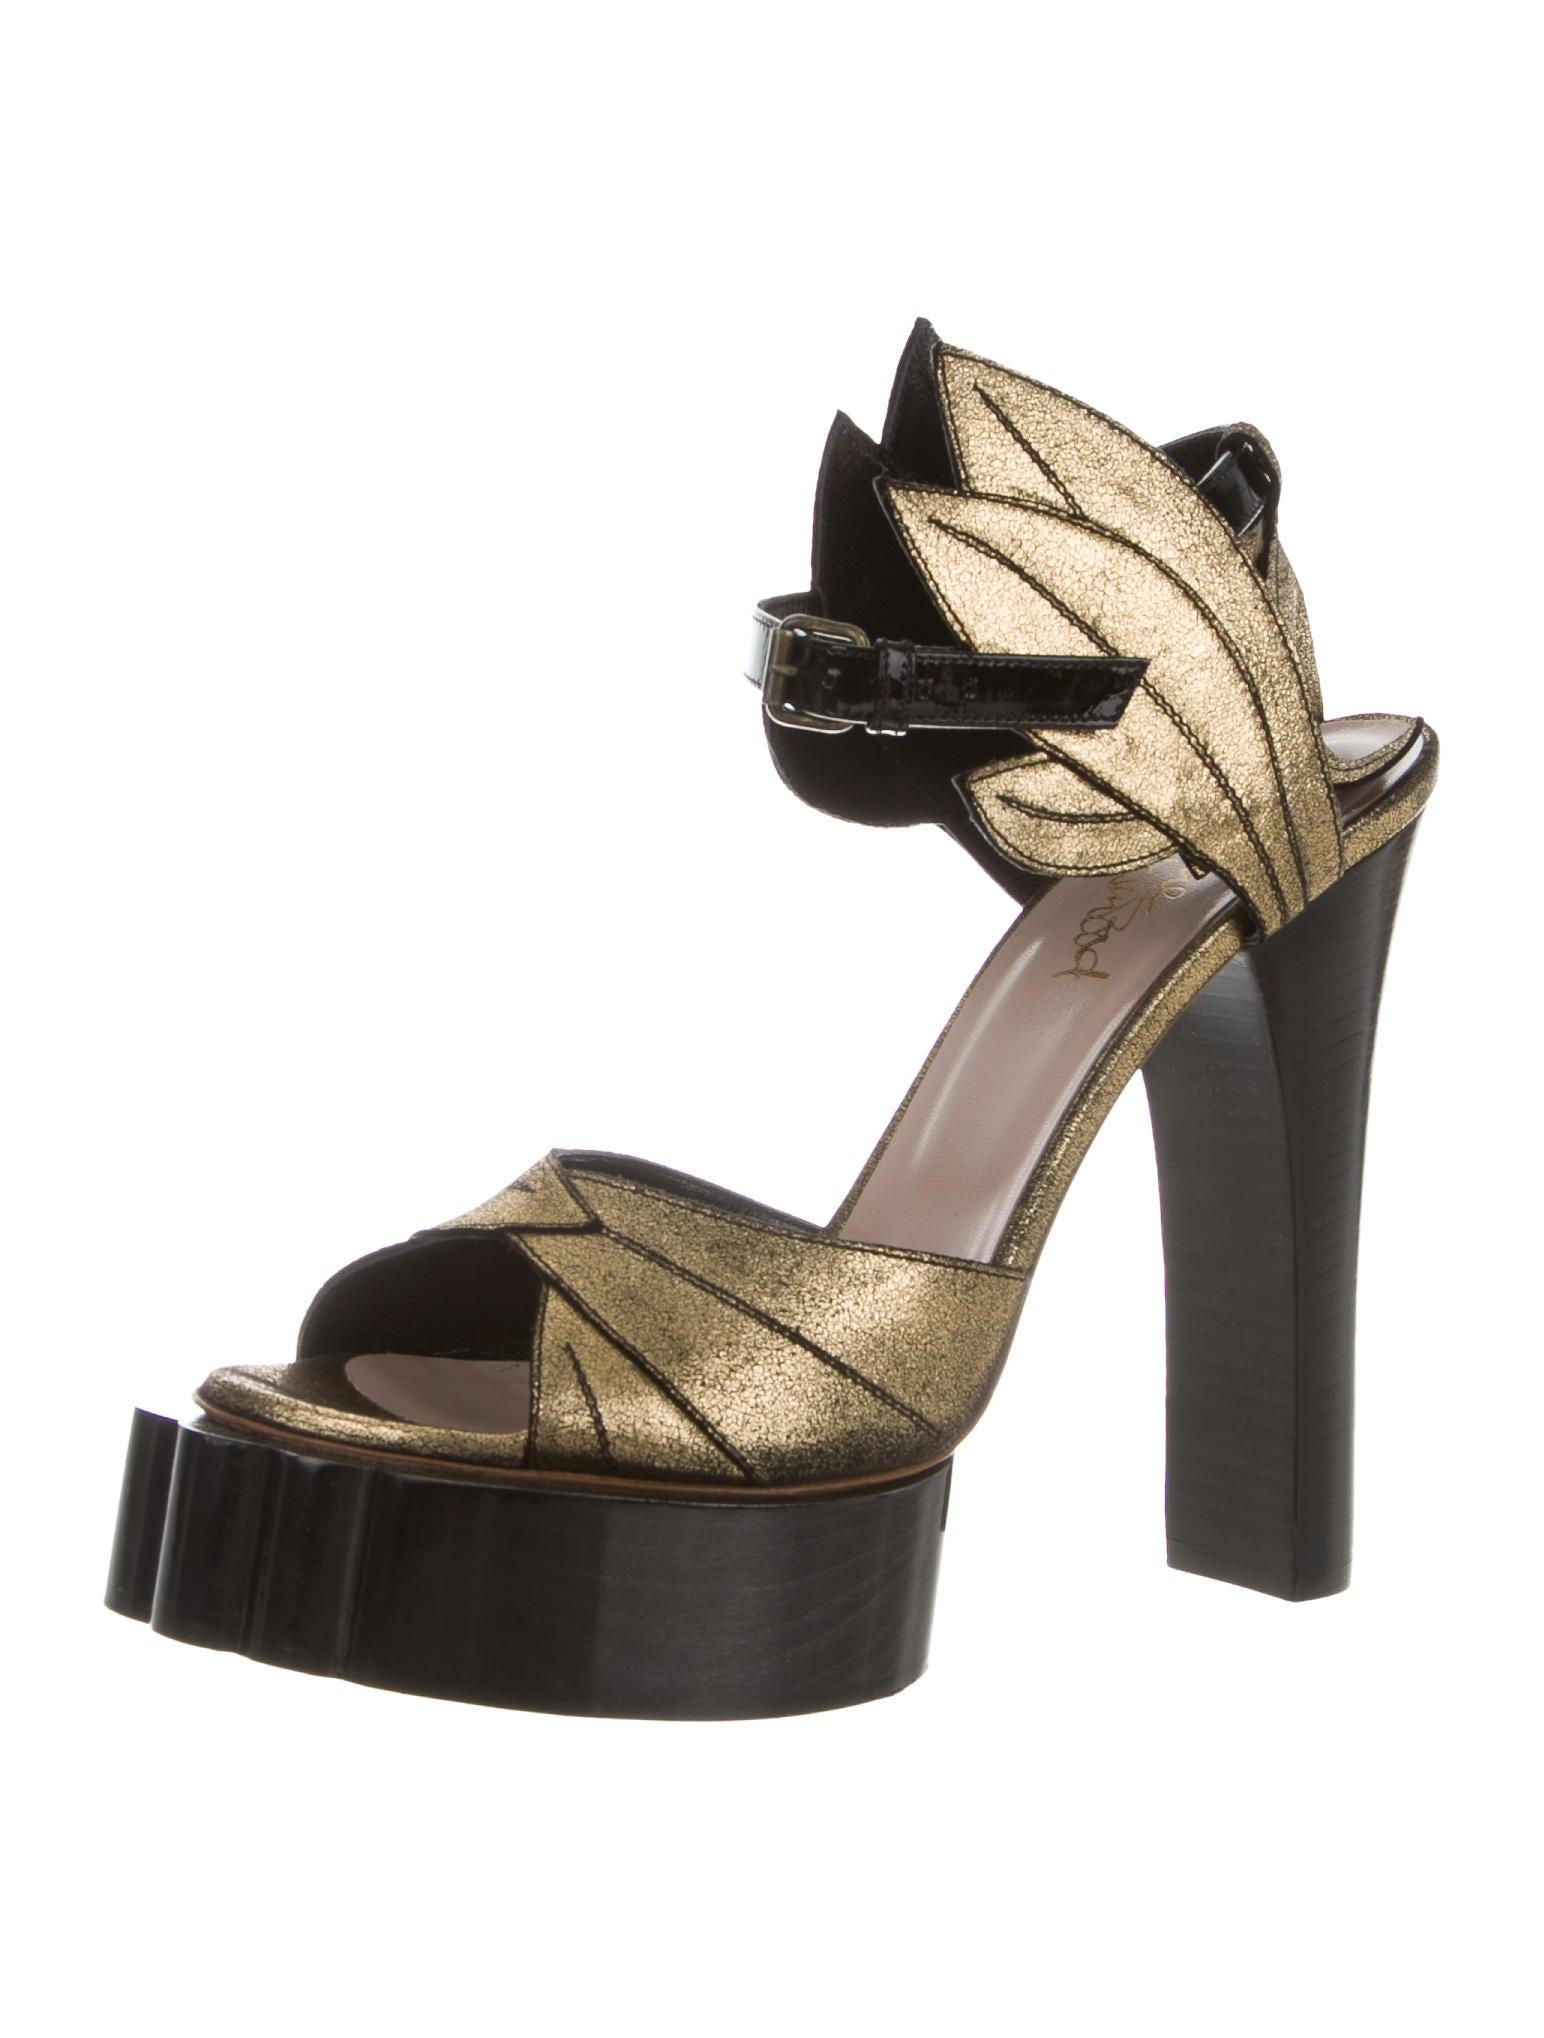 cheap sale the cheapest cheap 100% guaranteed Vivienne Westwood Aphrodite Beast Platform Sandals discount amazing price UFf2BtrMl